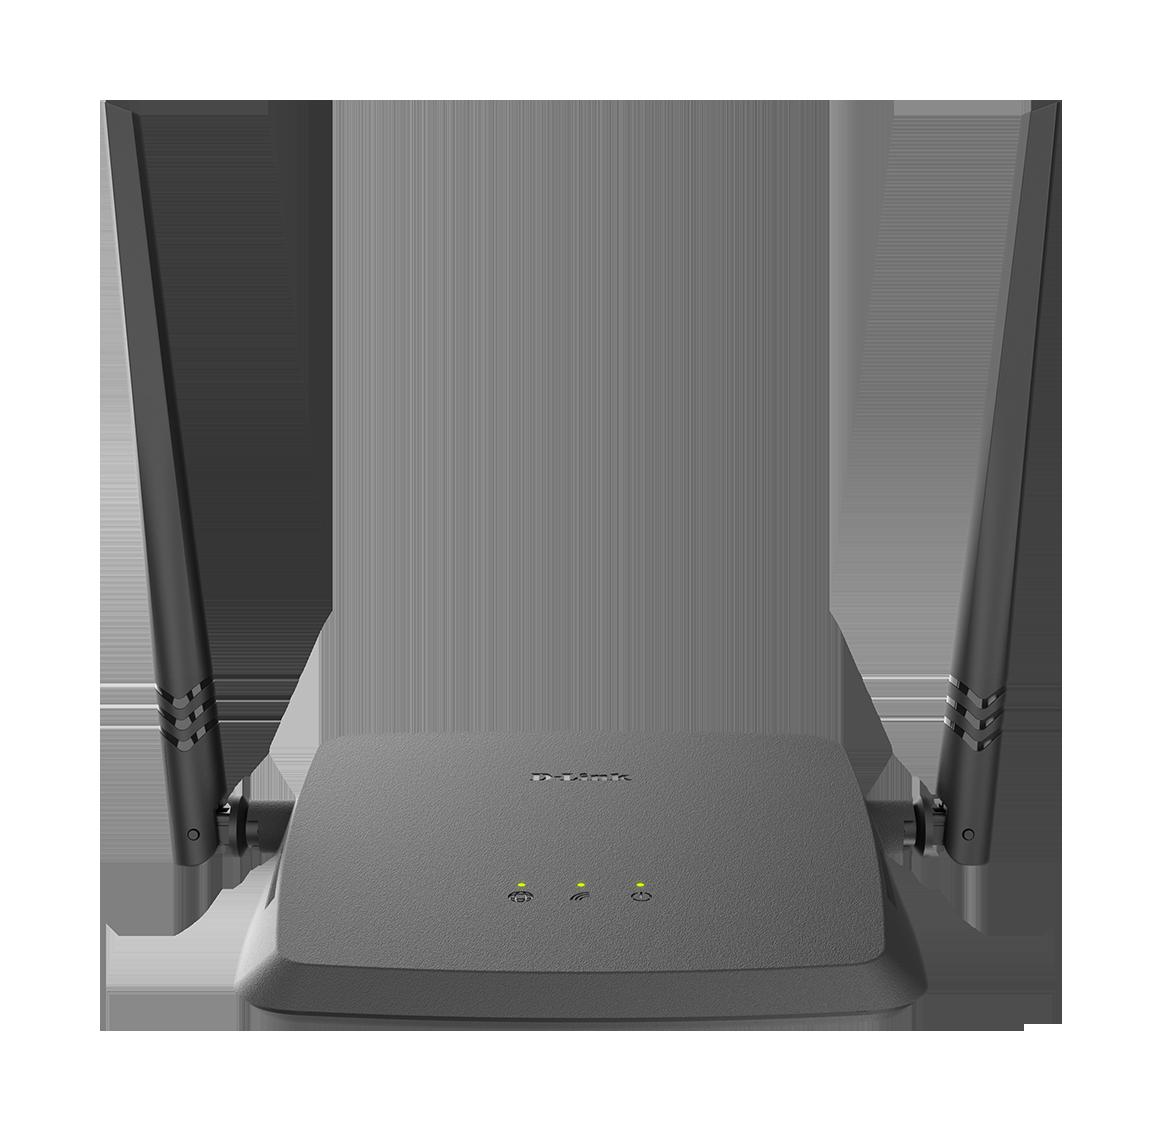 Roteador Wi-Fi N300 TR-069 com PRESET & VLAN IPTV/VoIP